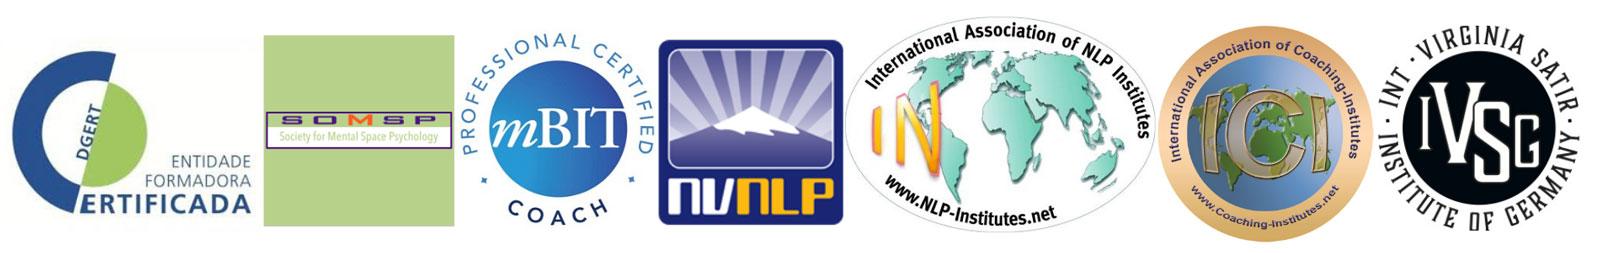 pnl-portugal-logos